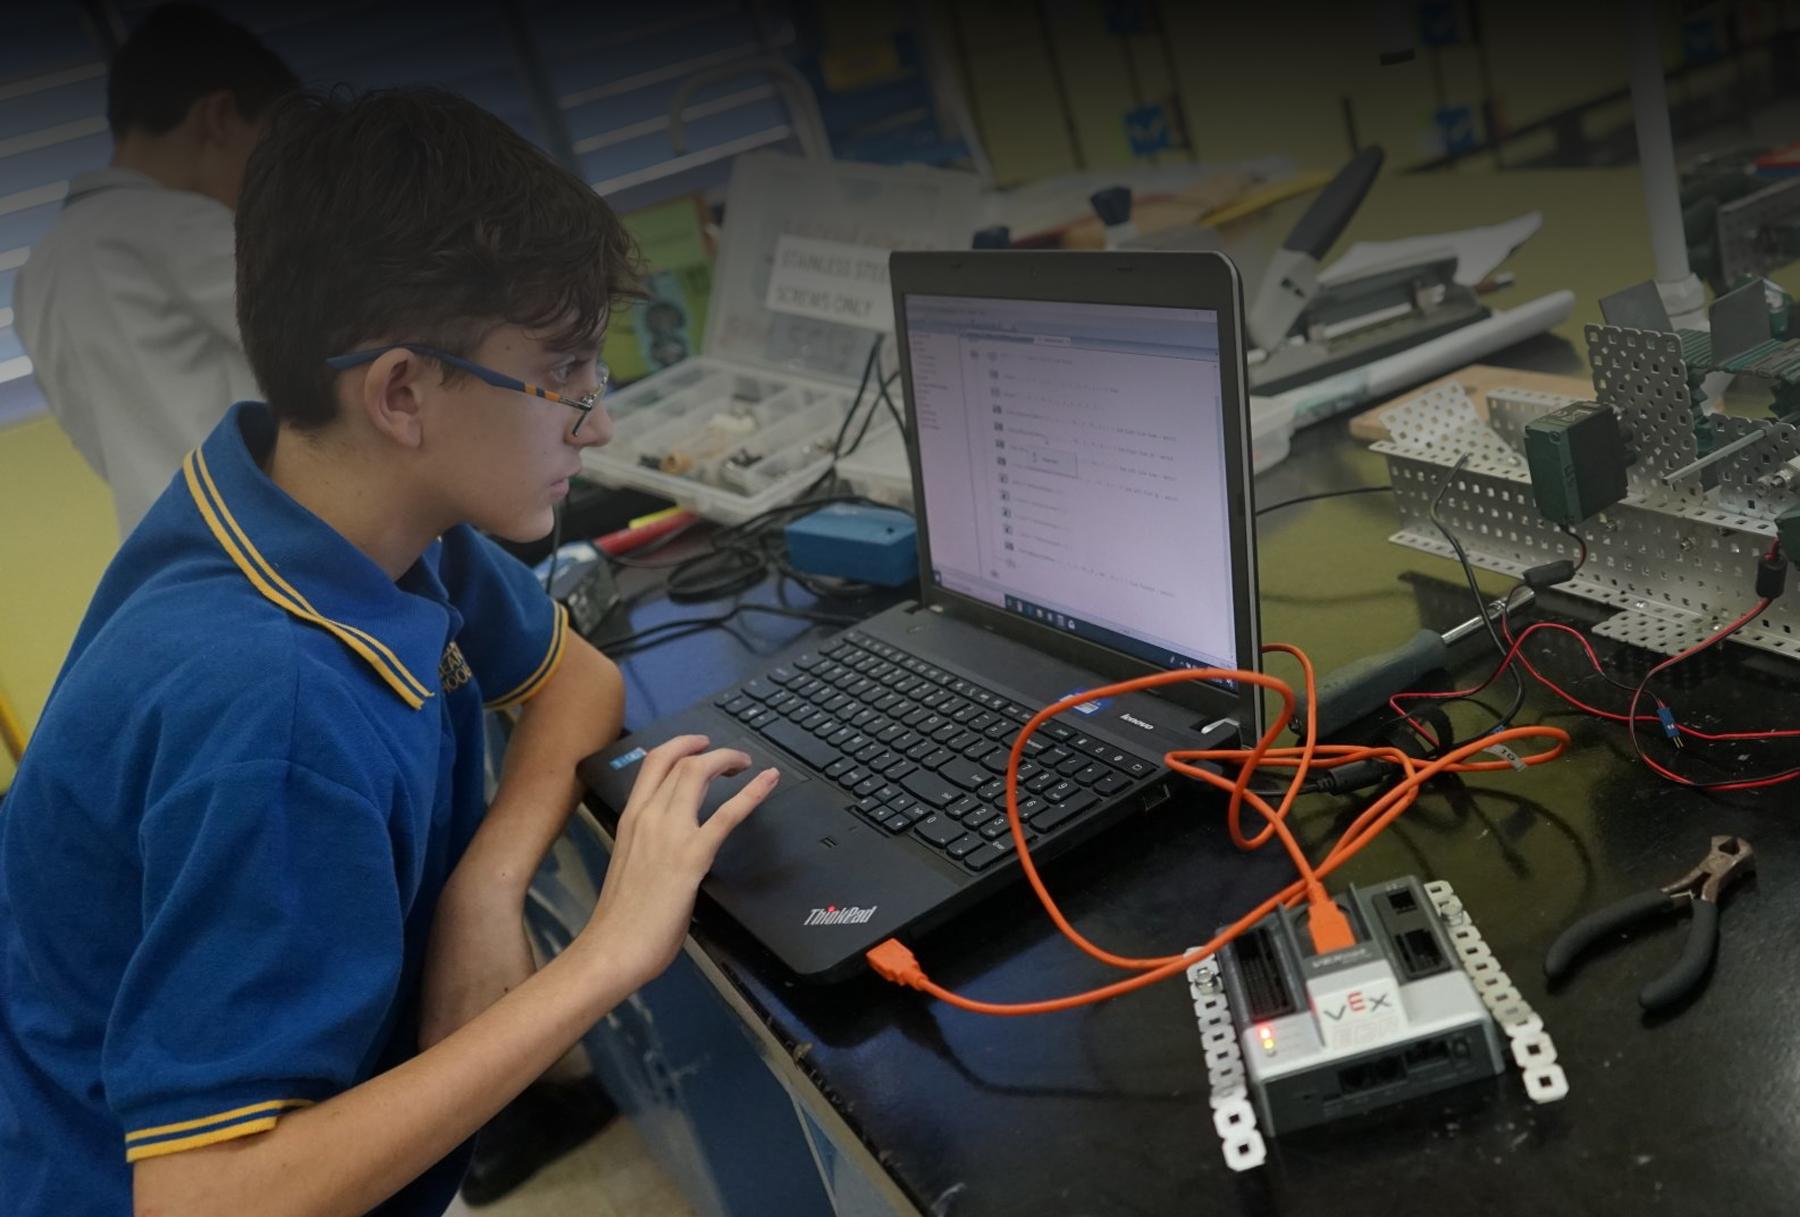 Robotics student using computer